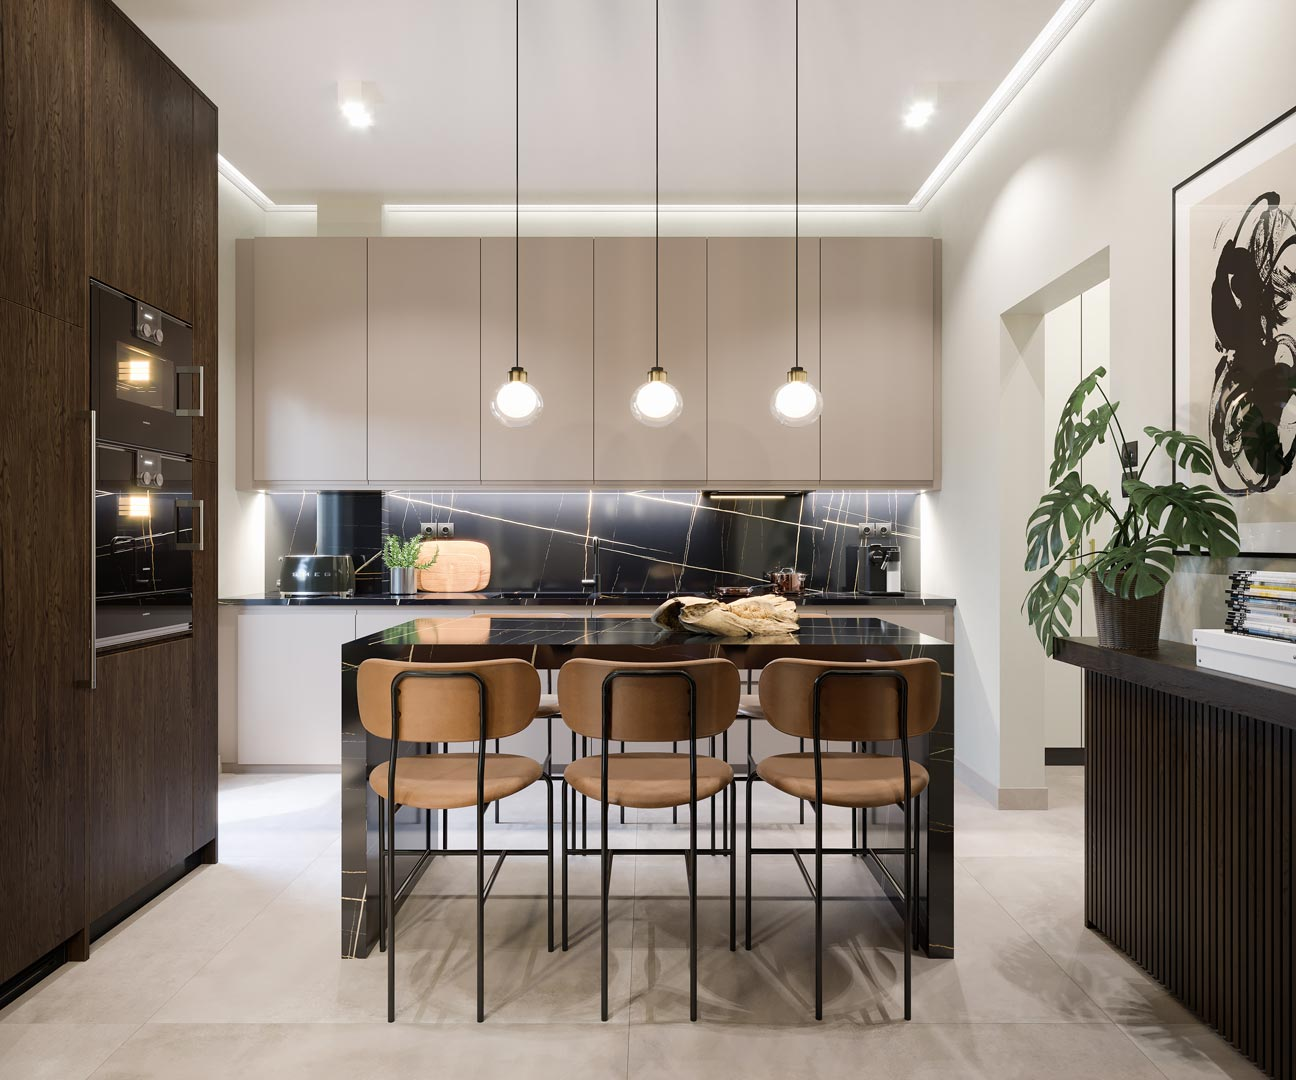 Kitchen by Xenia Liodi